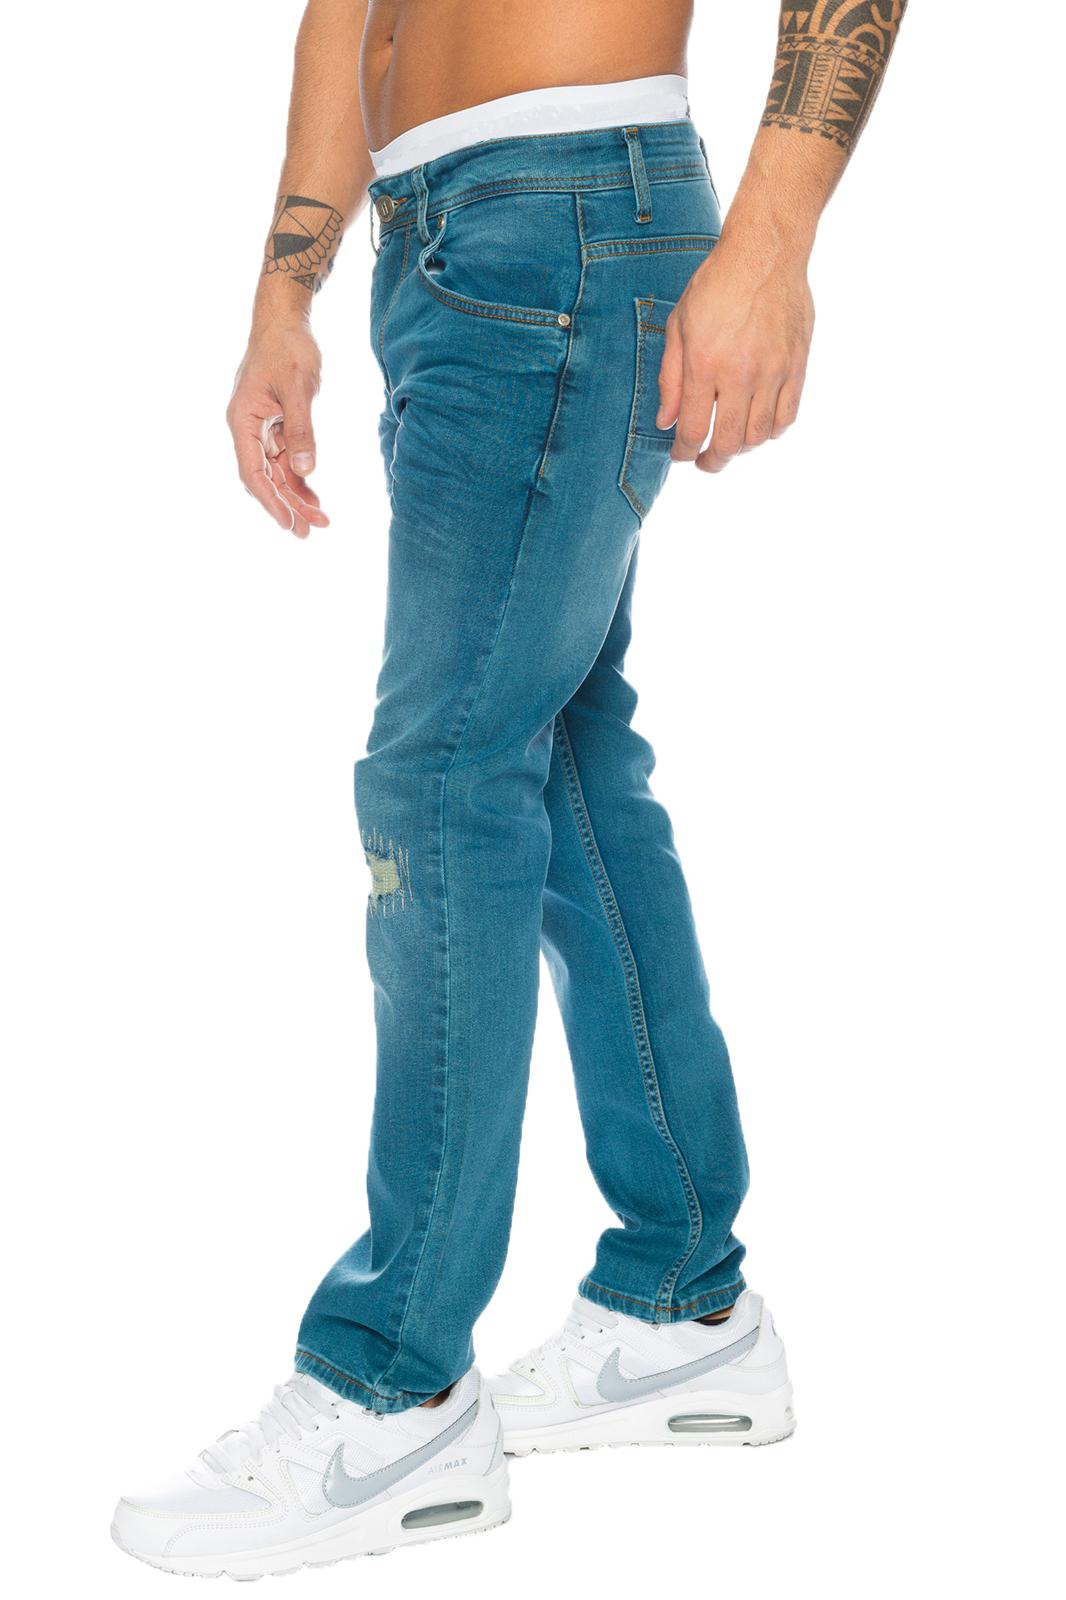 rock creek herren jeanshose blau herren jeans used look. Black Bedroom Furniture Sets. Home Design Ideas